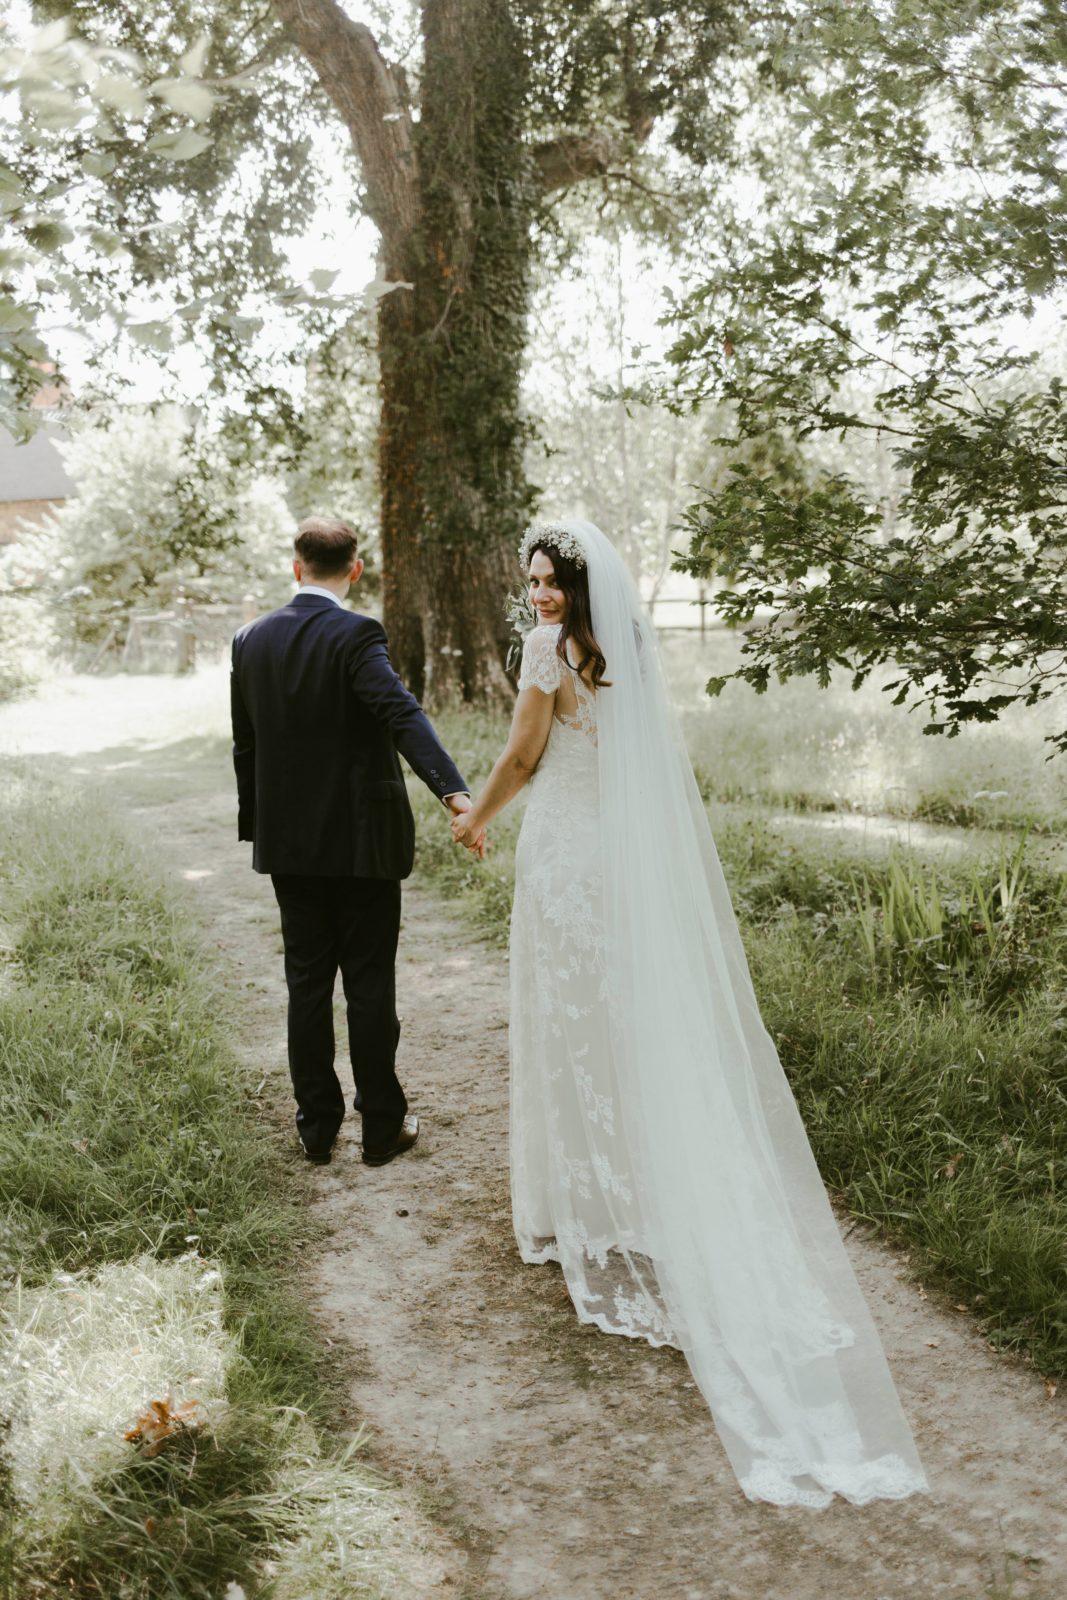 ramster-hall-wedding-photographer-photography-country-venue-surrey-uk-dana-bolton-dress-couple